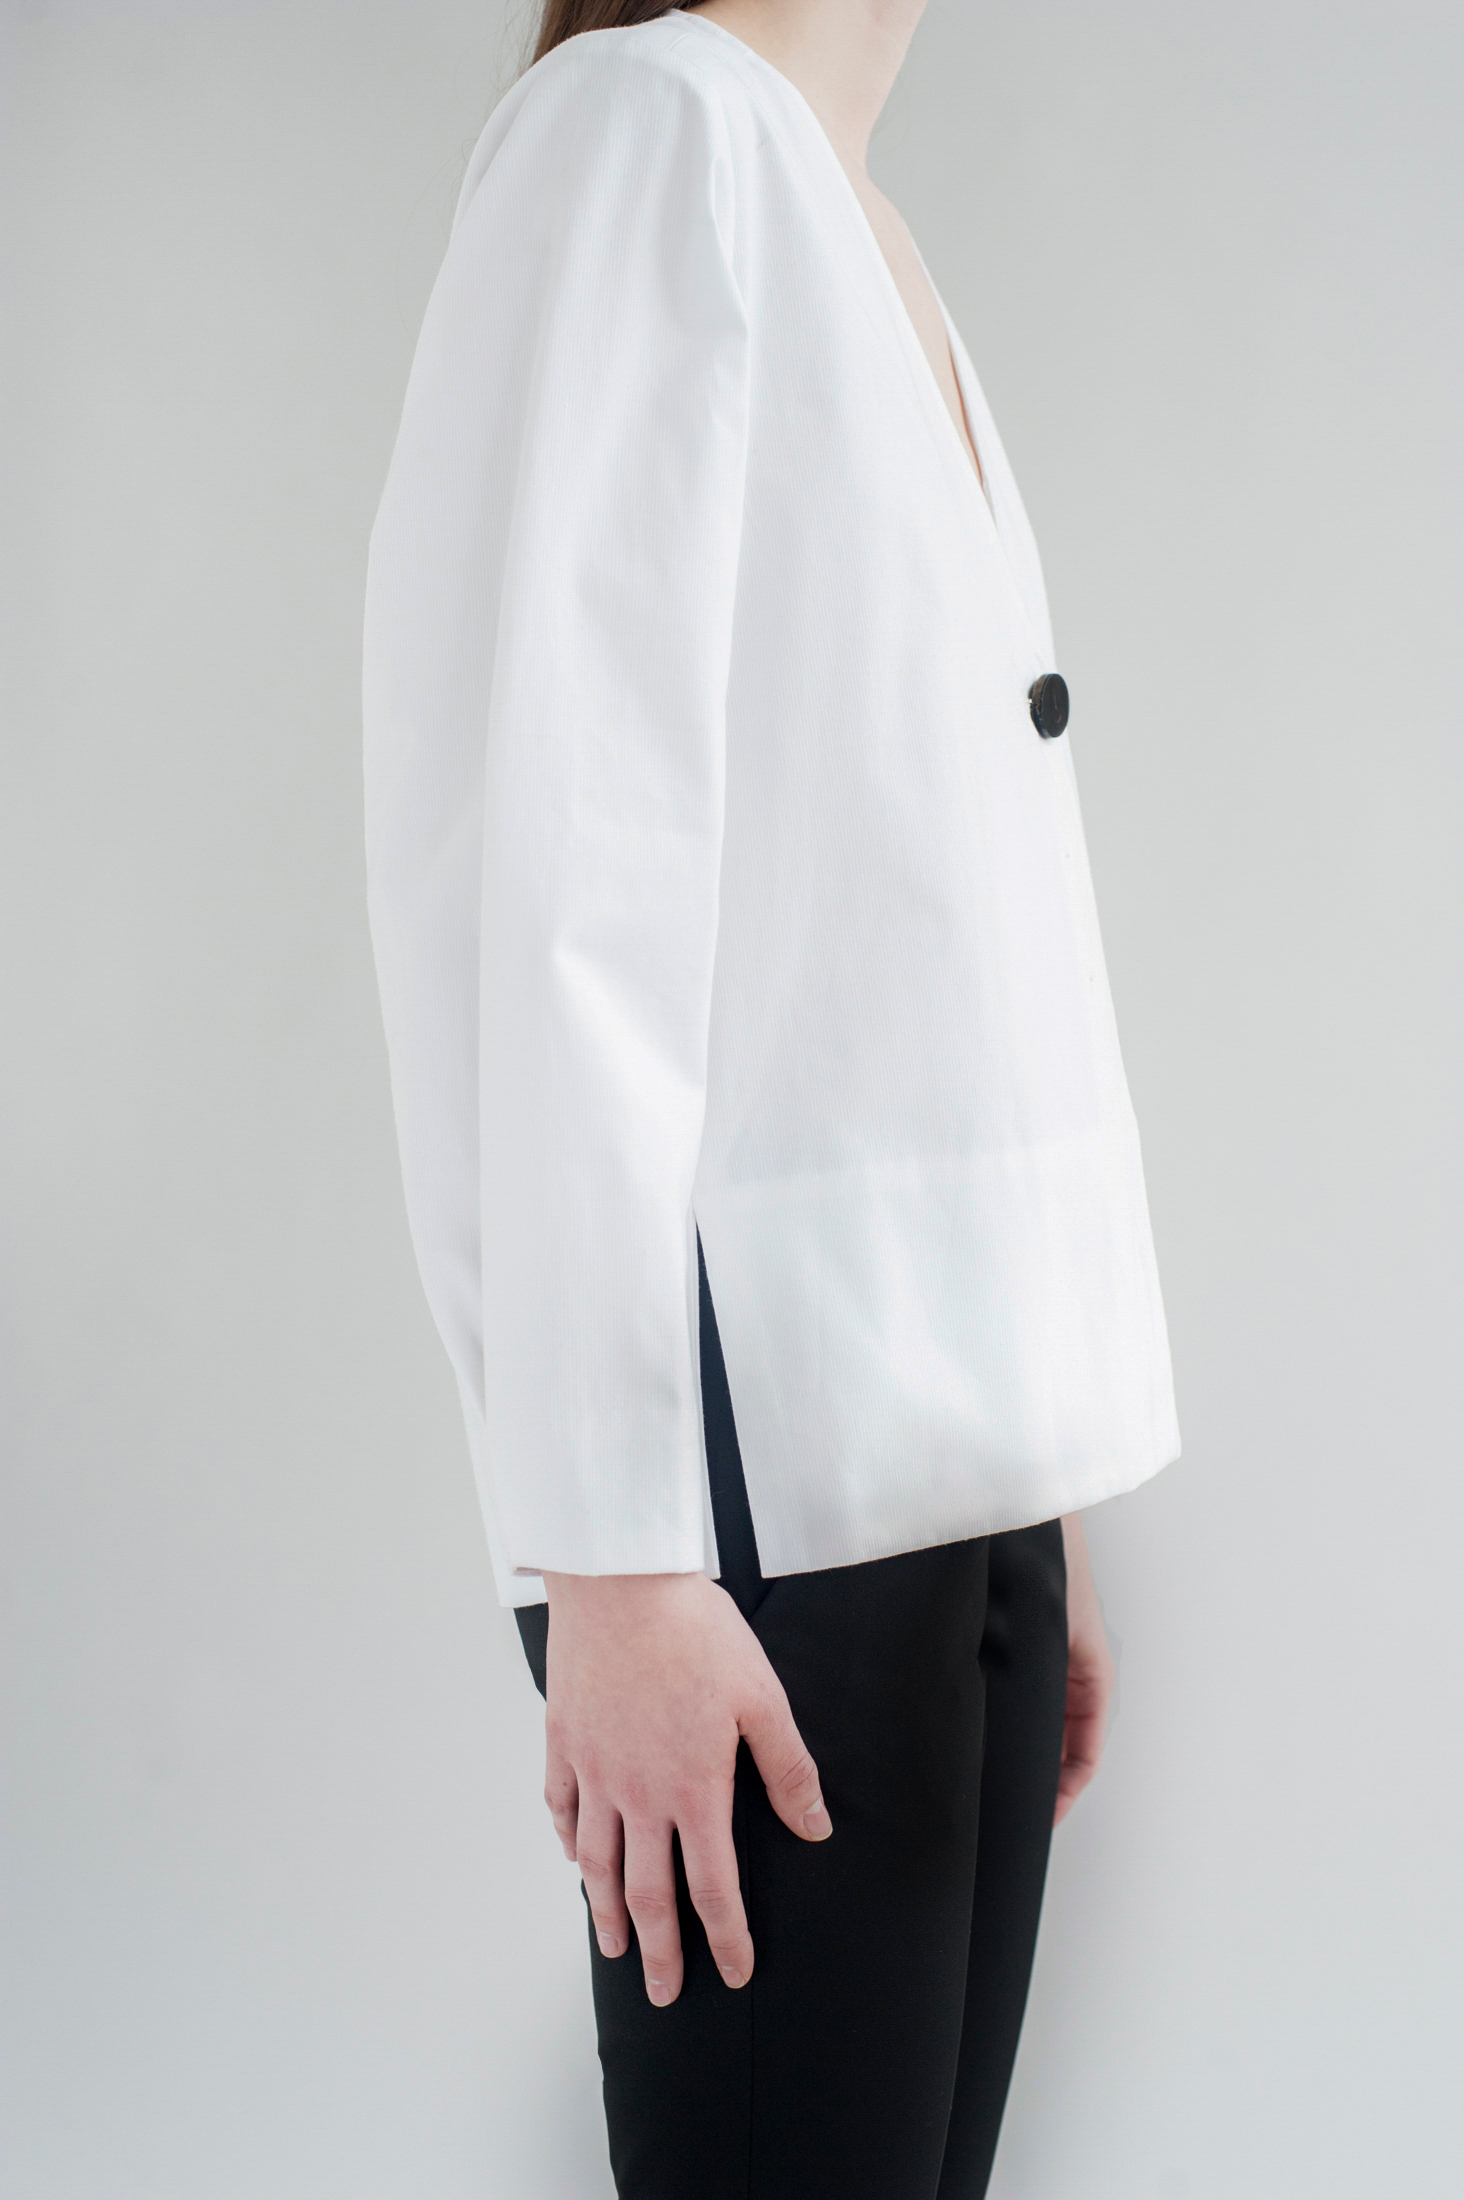 Shirt Jacket Starch De Smet